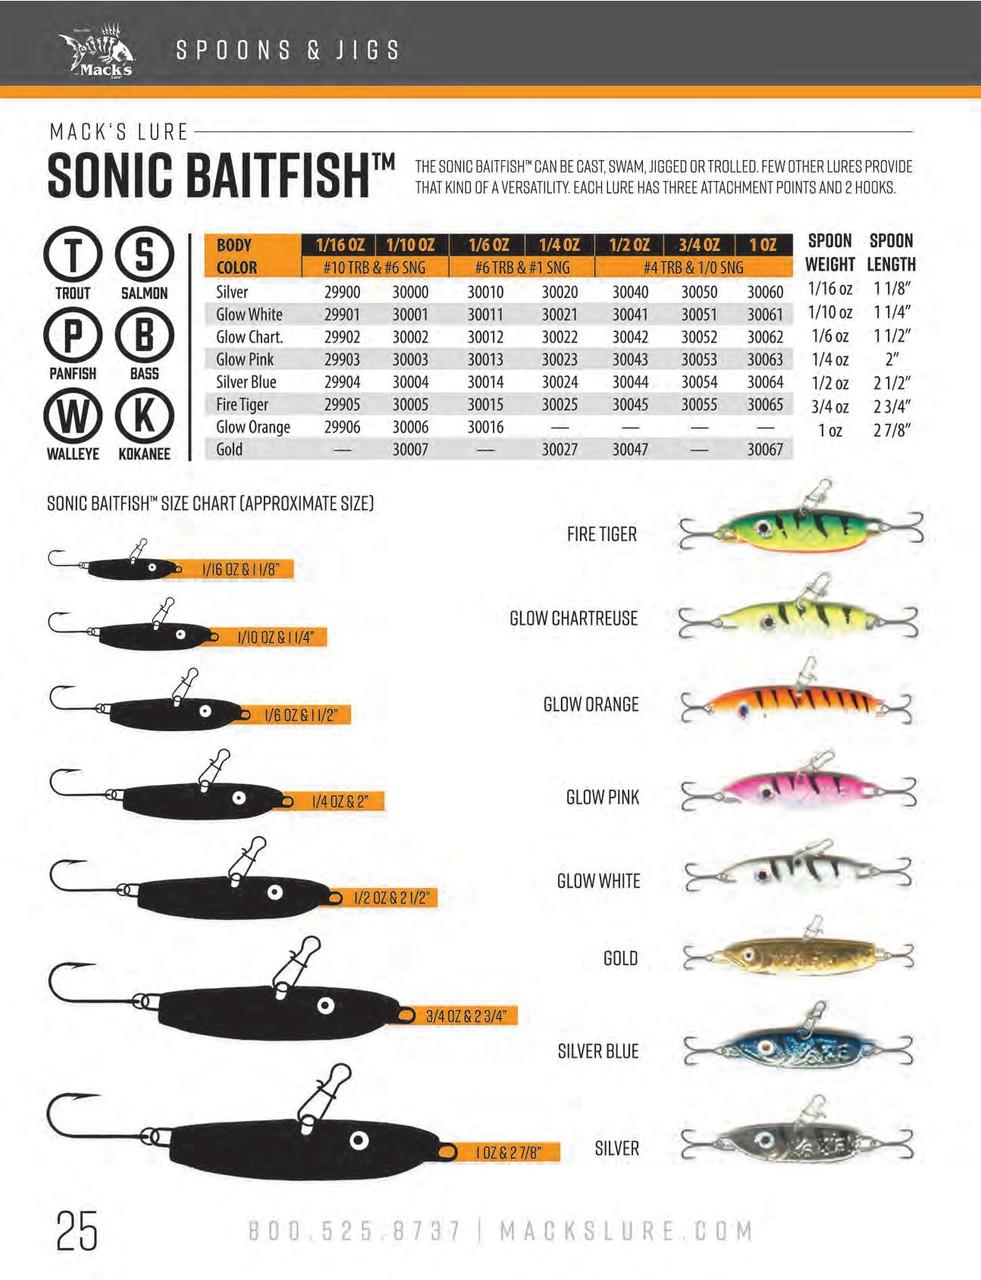 Macks Lure 30045 Sonic Baitfish Fire Tiger